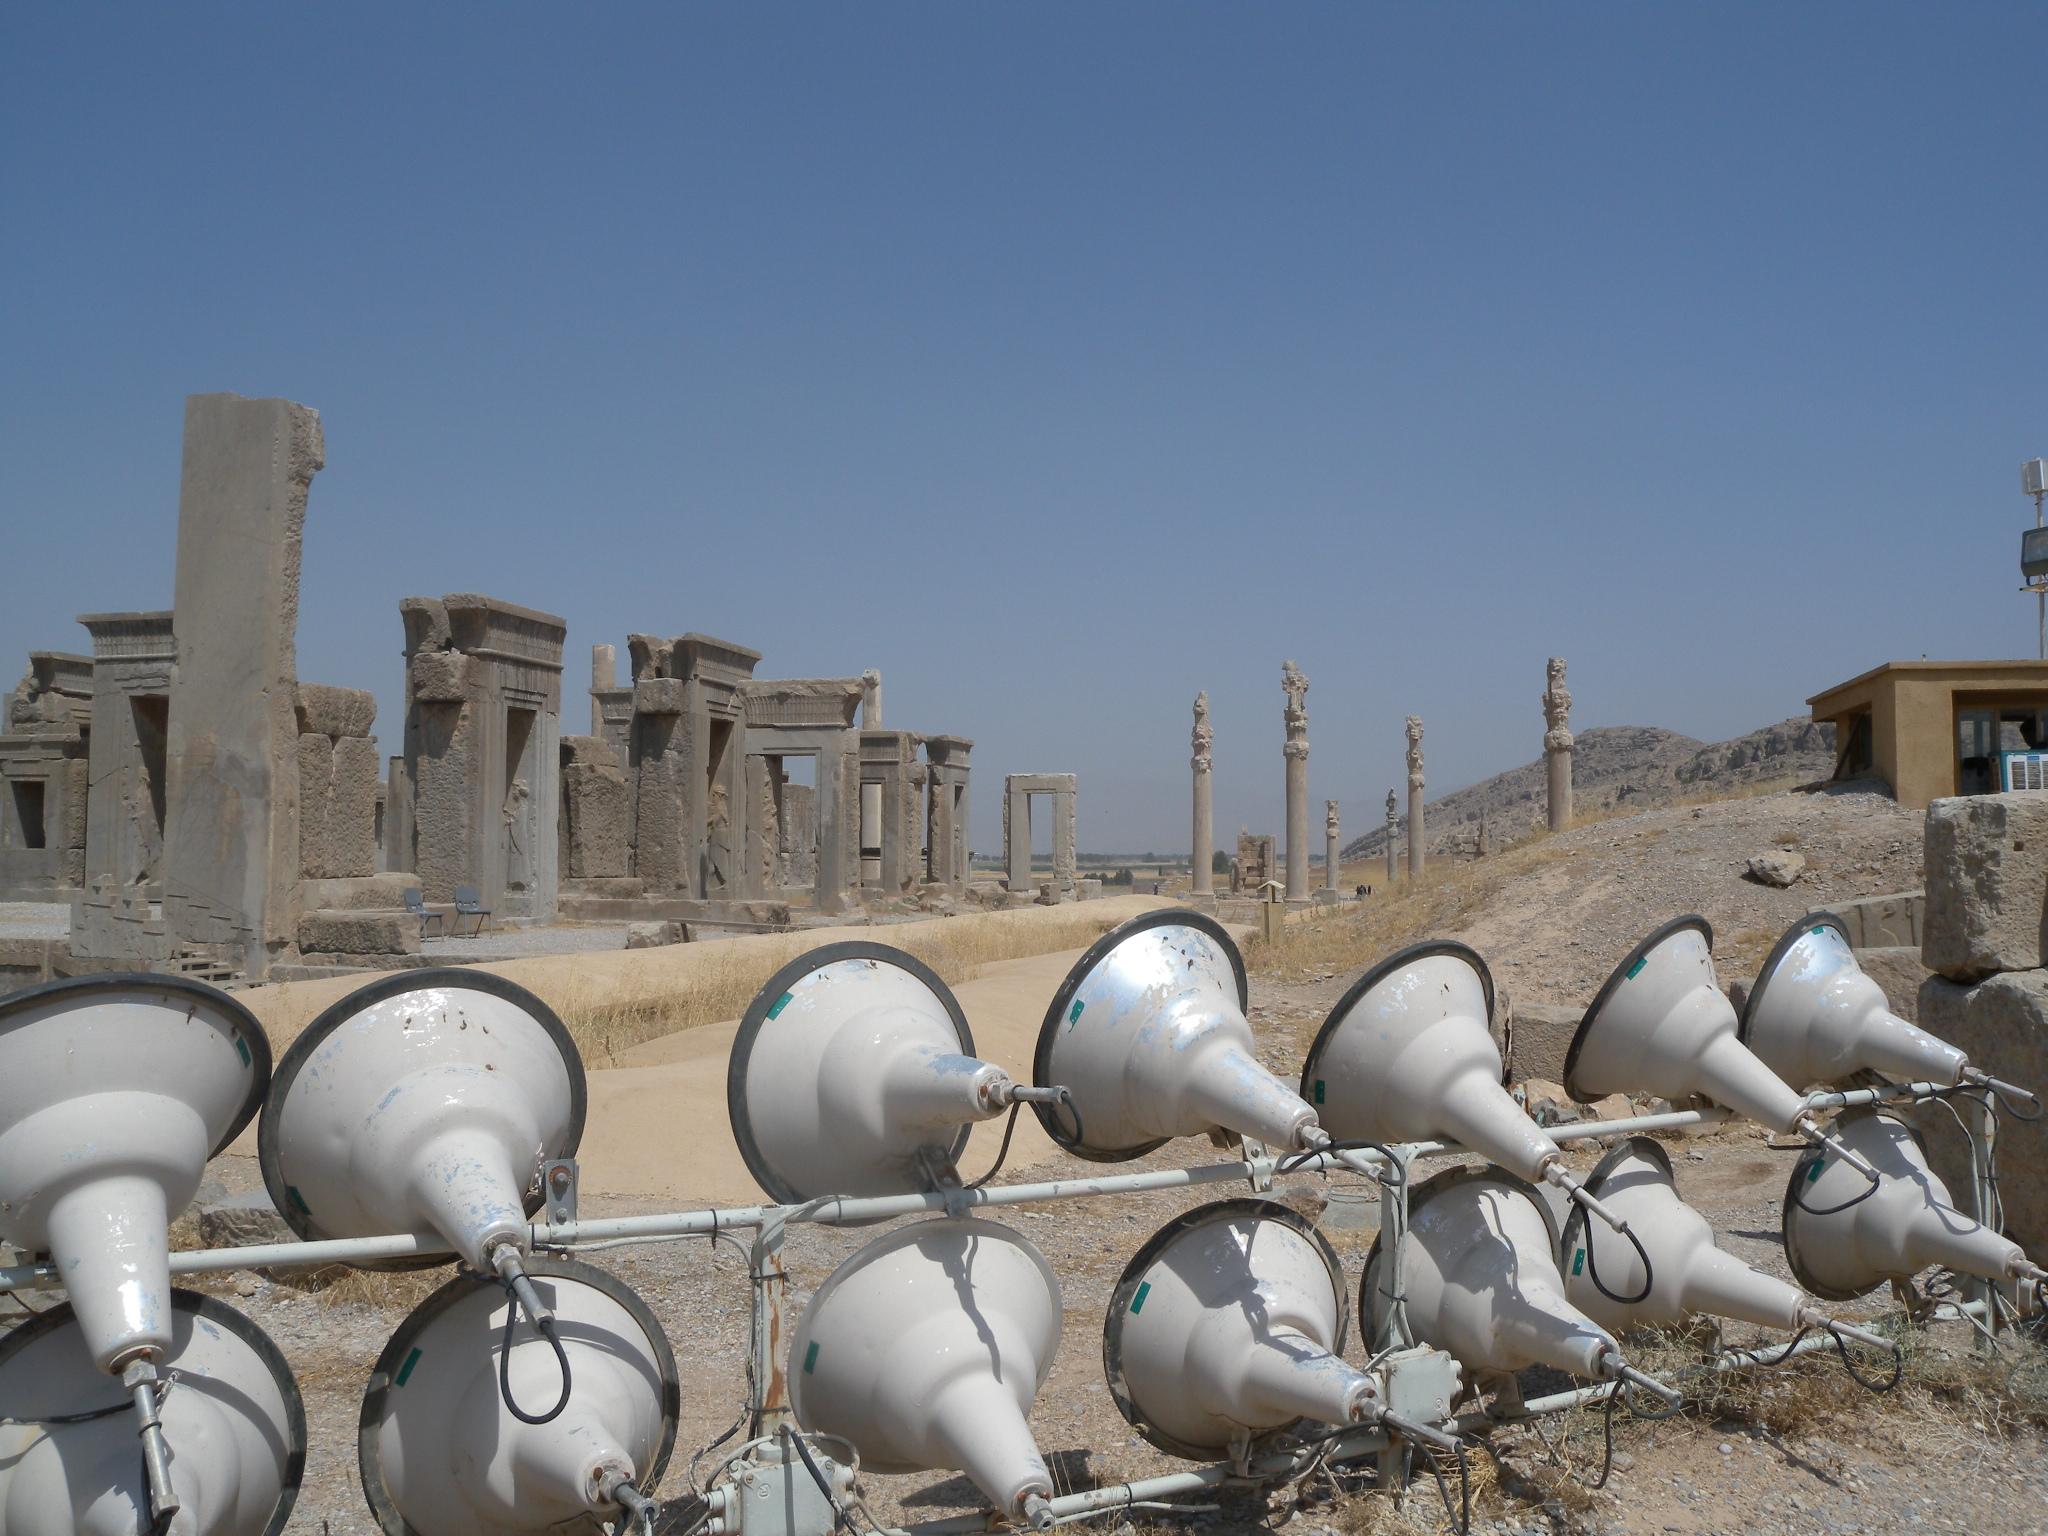 Spotlights at the ruins of ancient Persian city of Persepolis (Takhte Jamshid). Photo: Maite Elorza